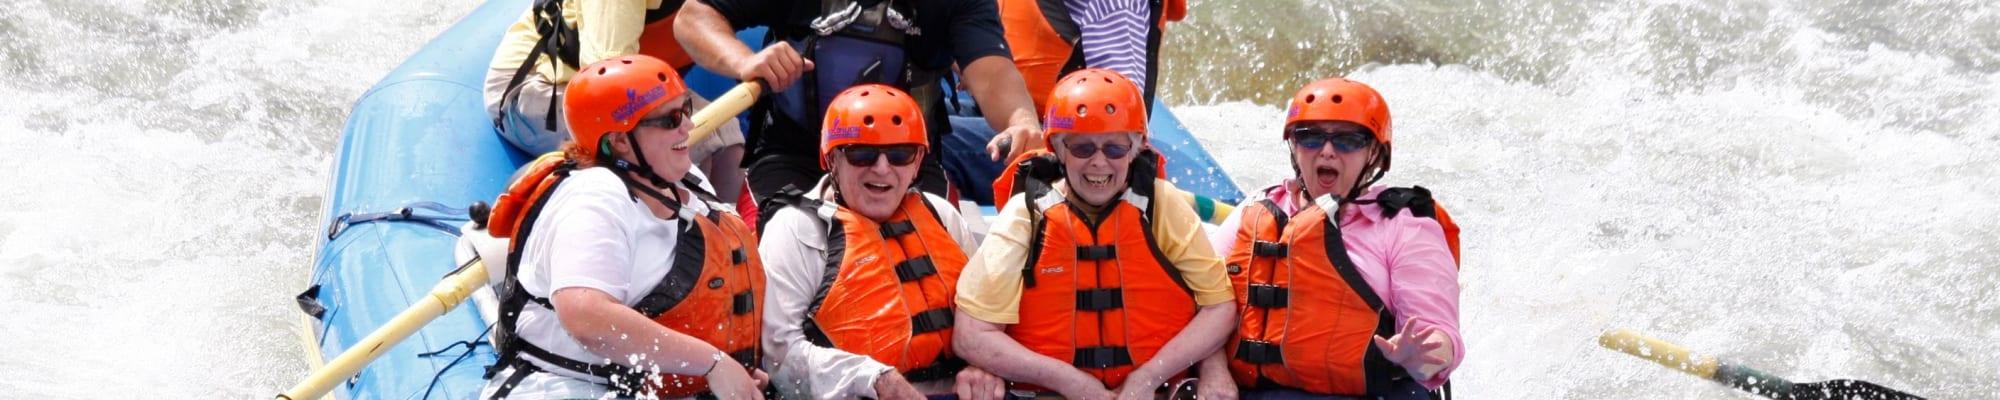 Blog at Stoneridge Gracious Retirement Living in Cary, North Carolina